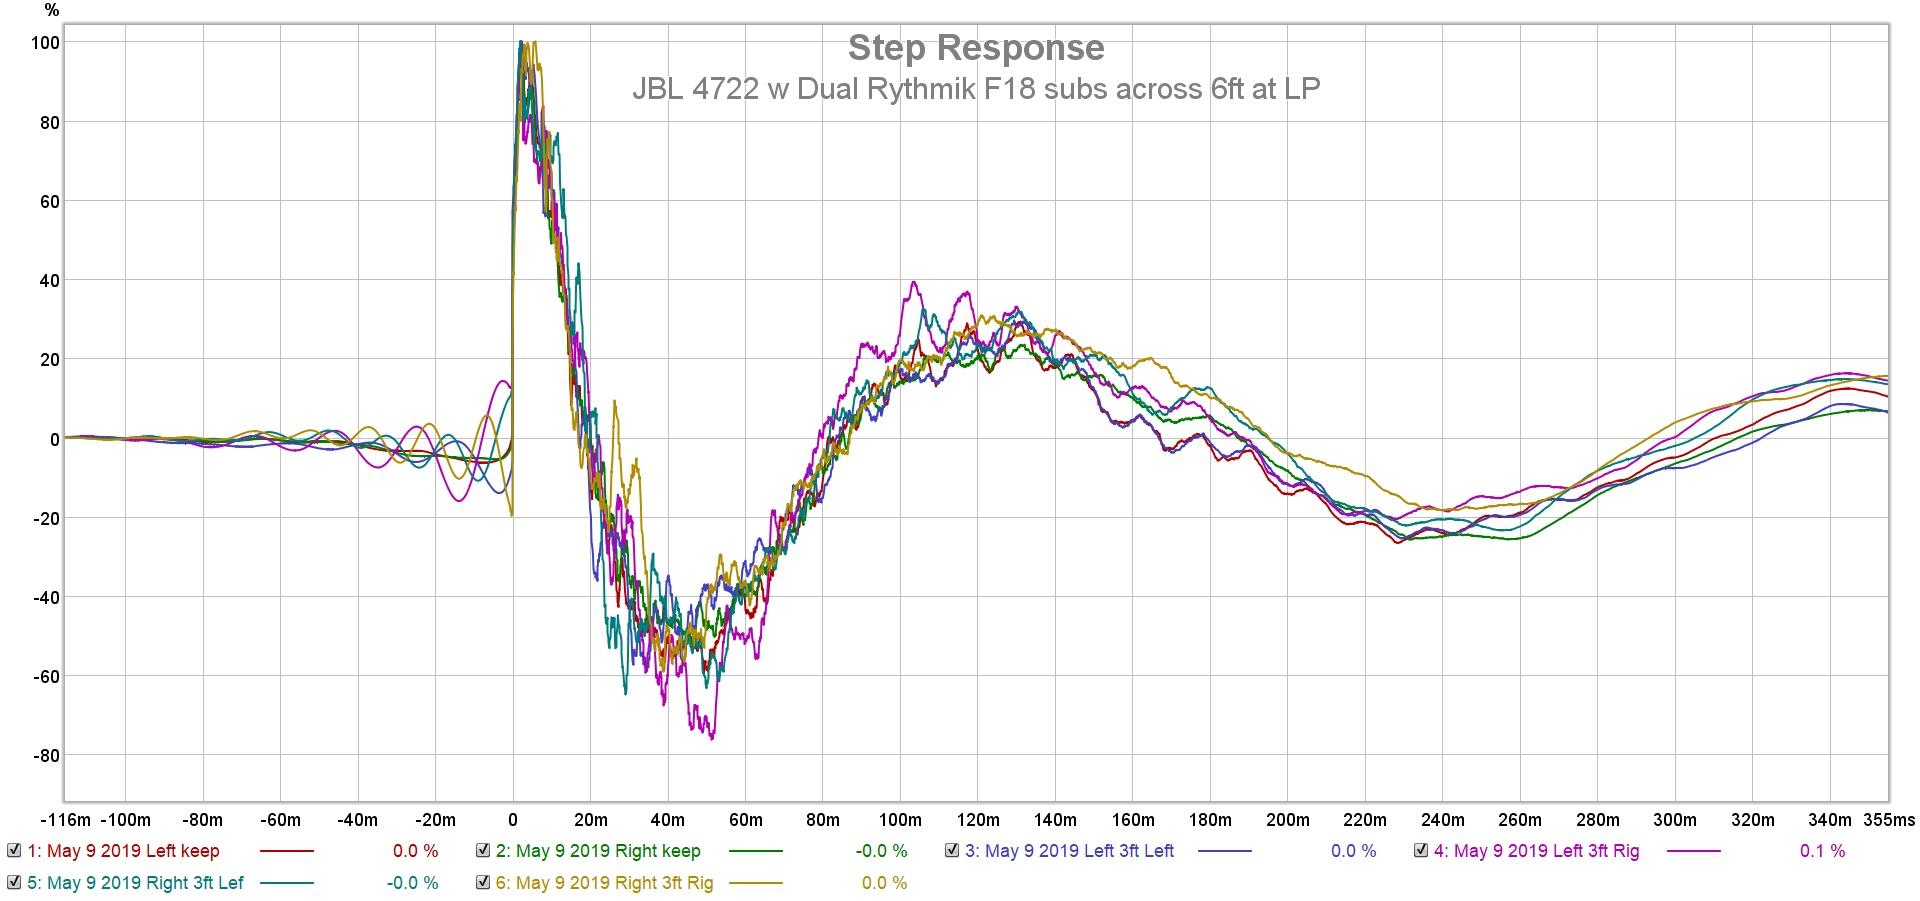 JBL 4722 w Dual Rythmik F18 subs across 6ft at LP step.jpg